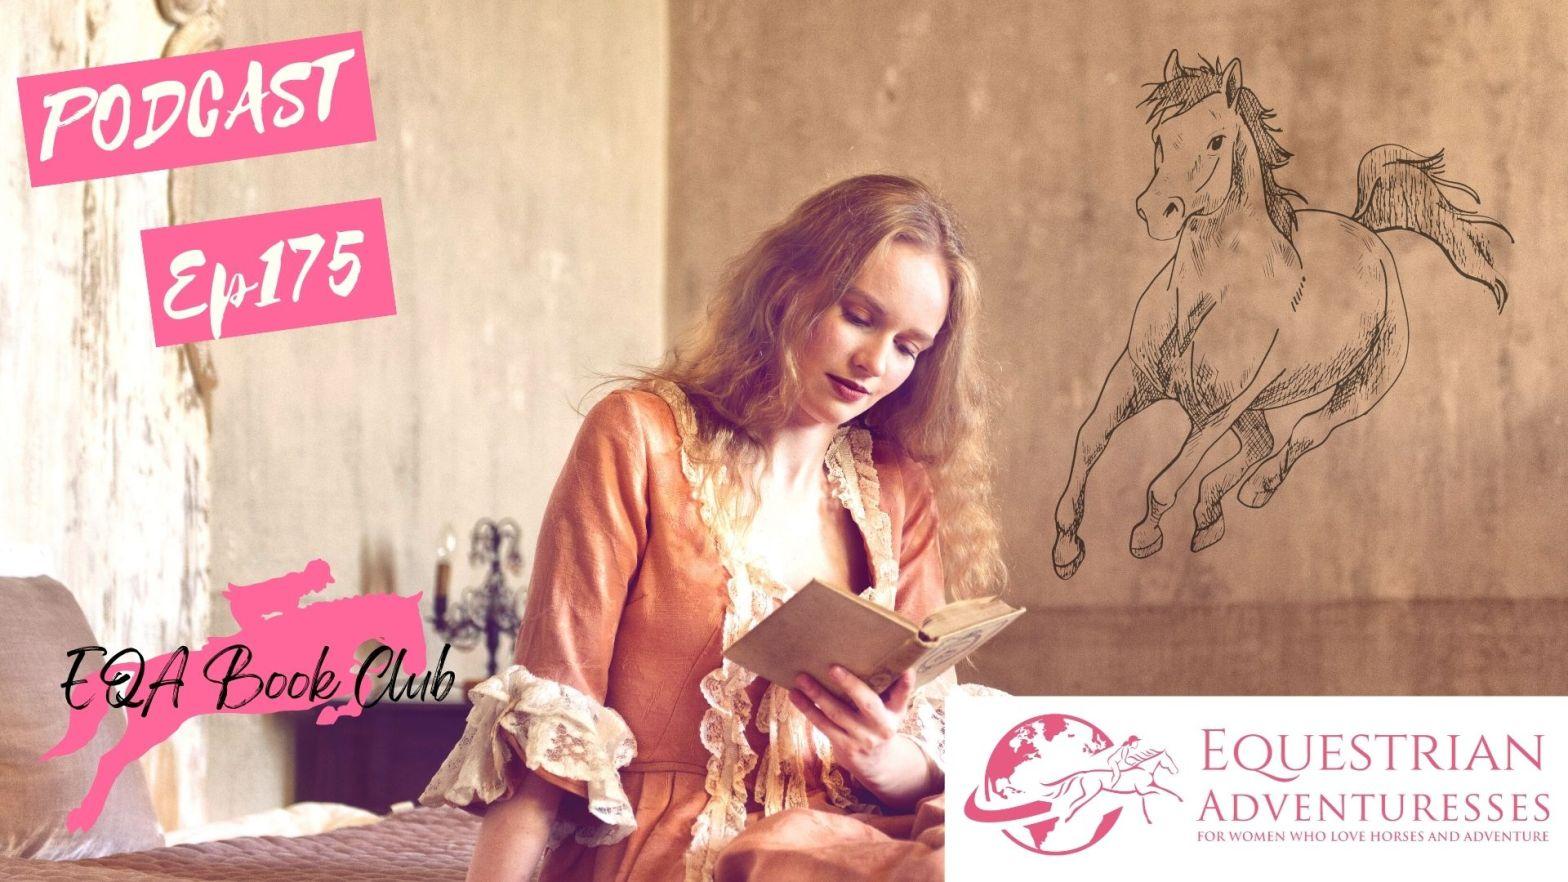 Equestrian Adventuresses Travel and Horse Podcast Ep 175 - EQA Book Club: Jane Austen & Horses